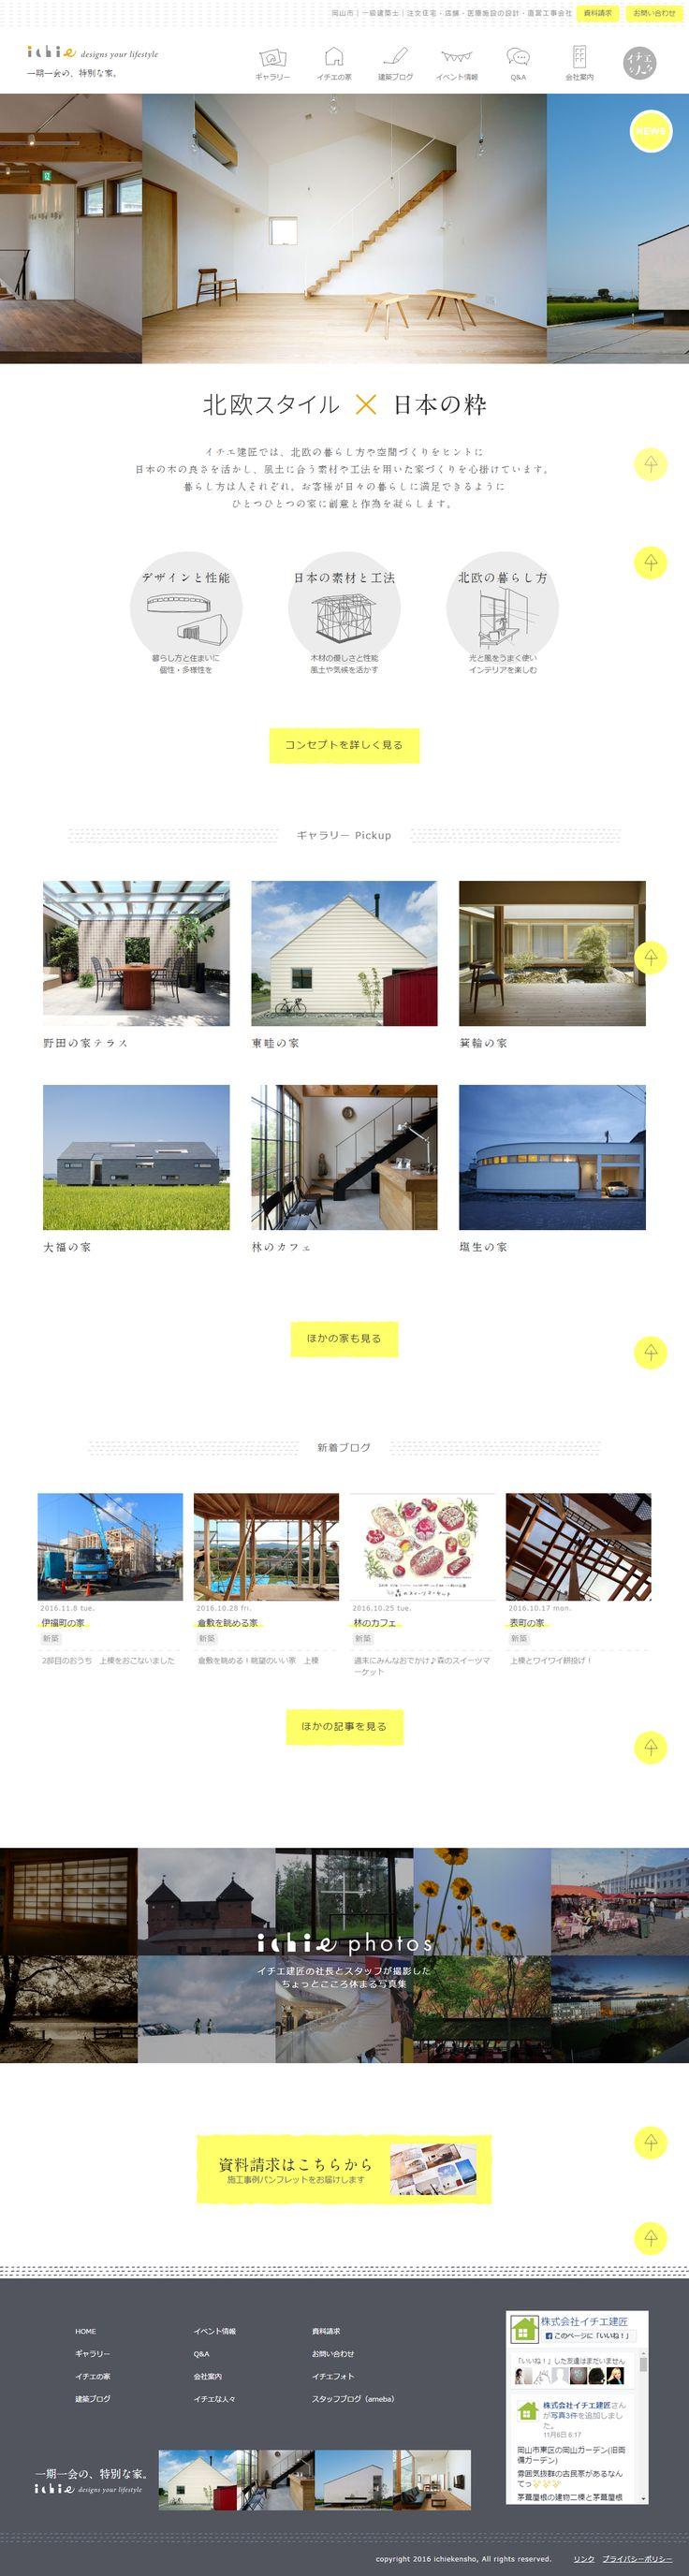 #architect-interior-web-design #corporate #1-column-layout #key-color-black #bg-color-white #Japanese #Slider